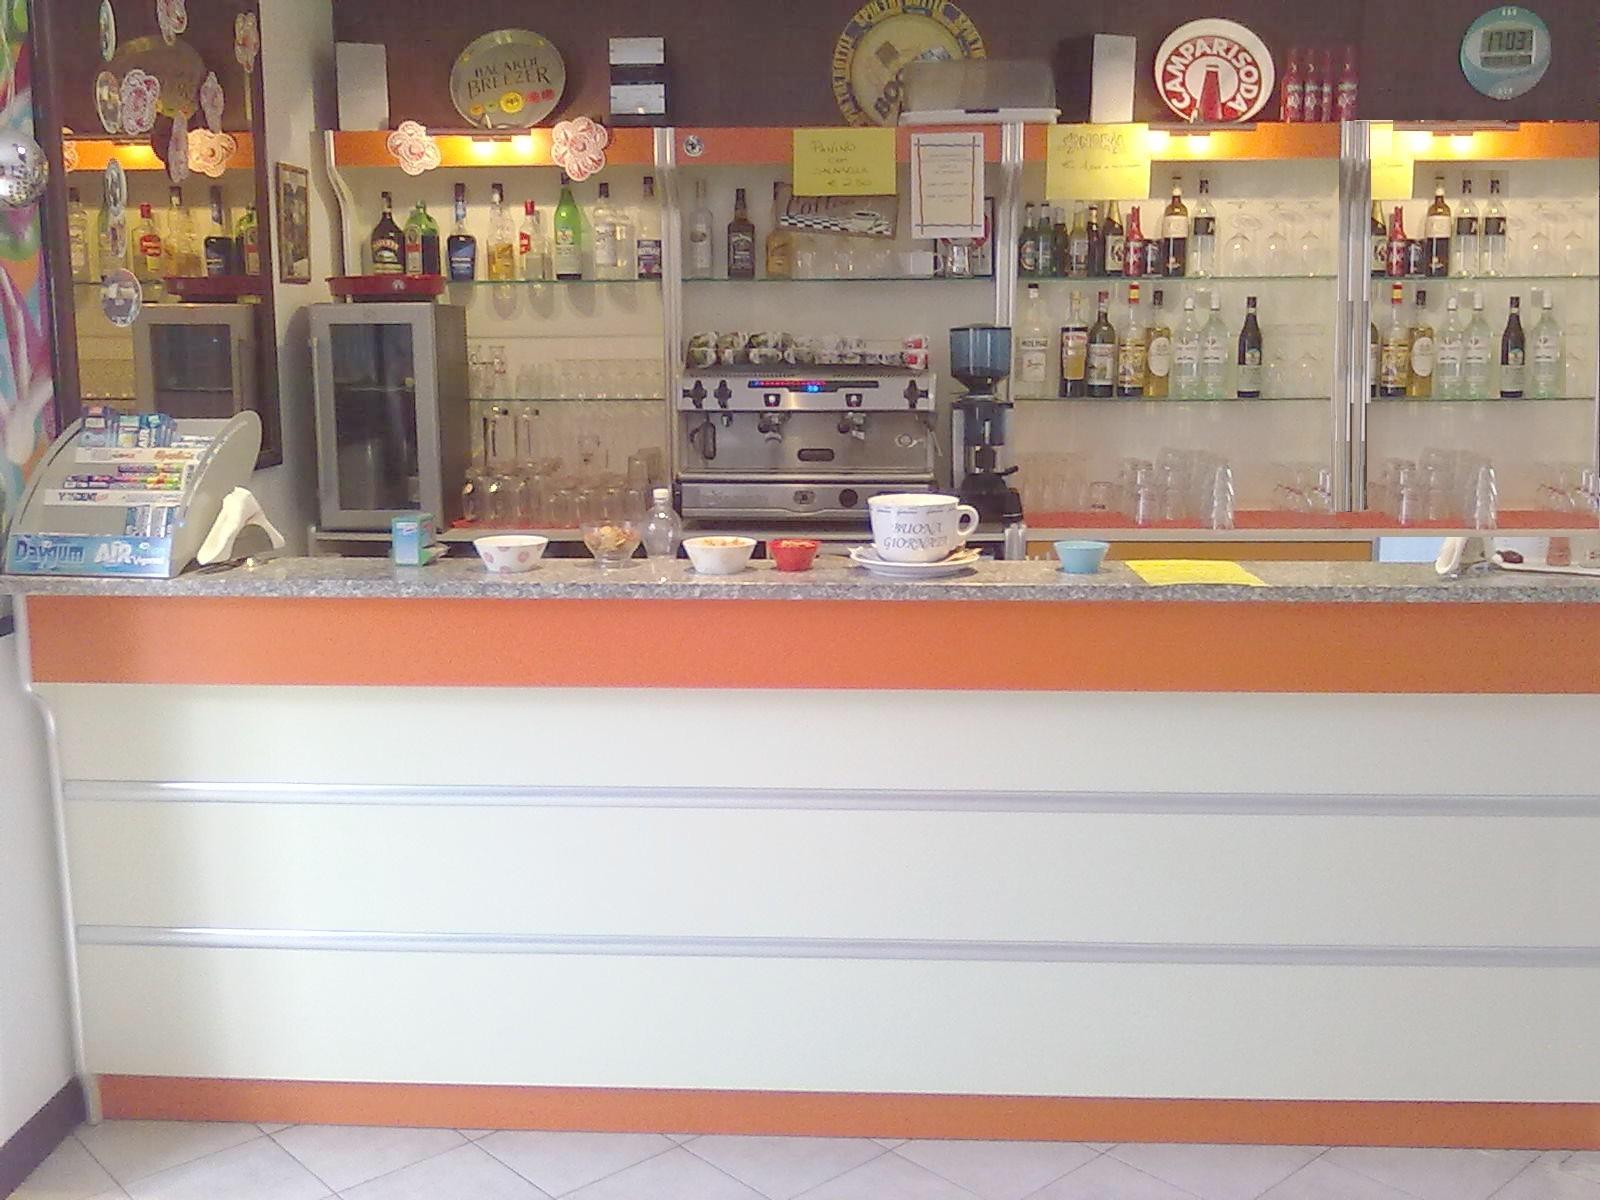 Banchi bar compra in fabbrica a met prezzo novit bar for Banconi bar usati roma